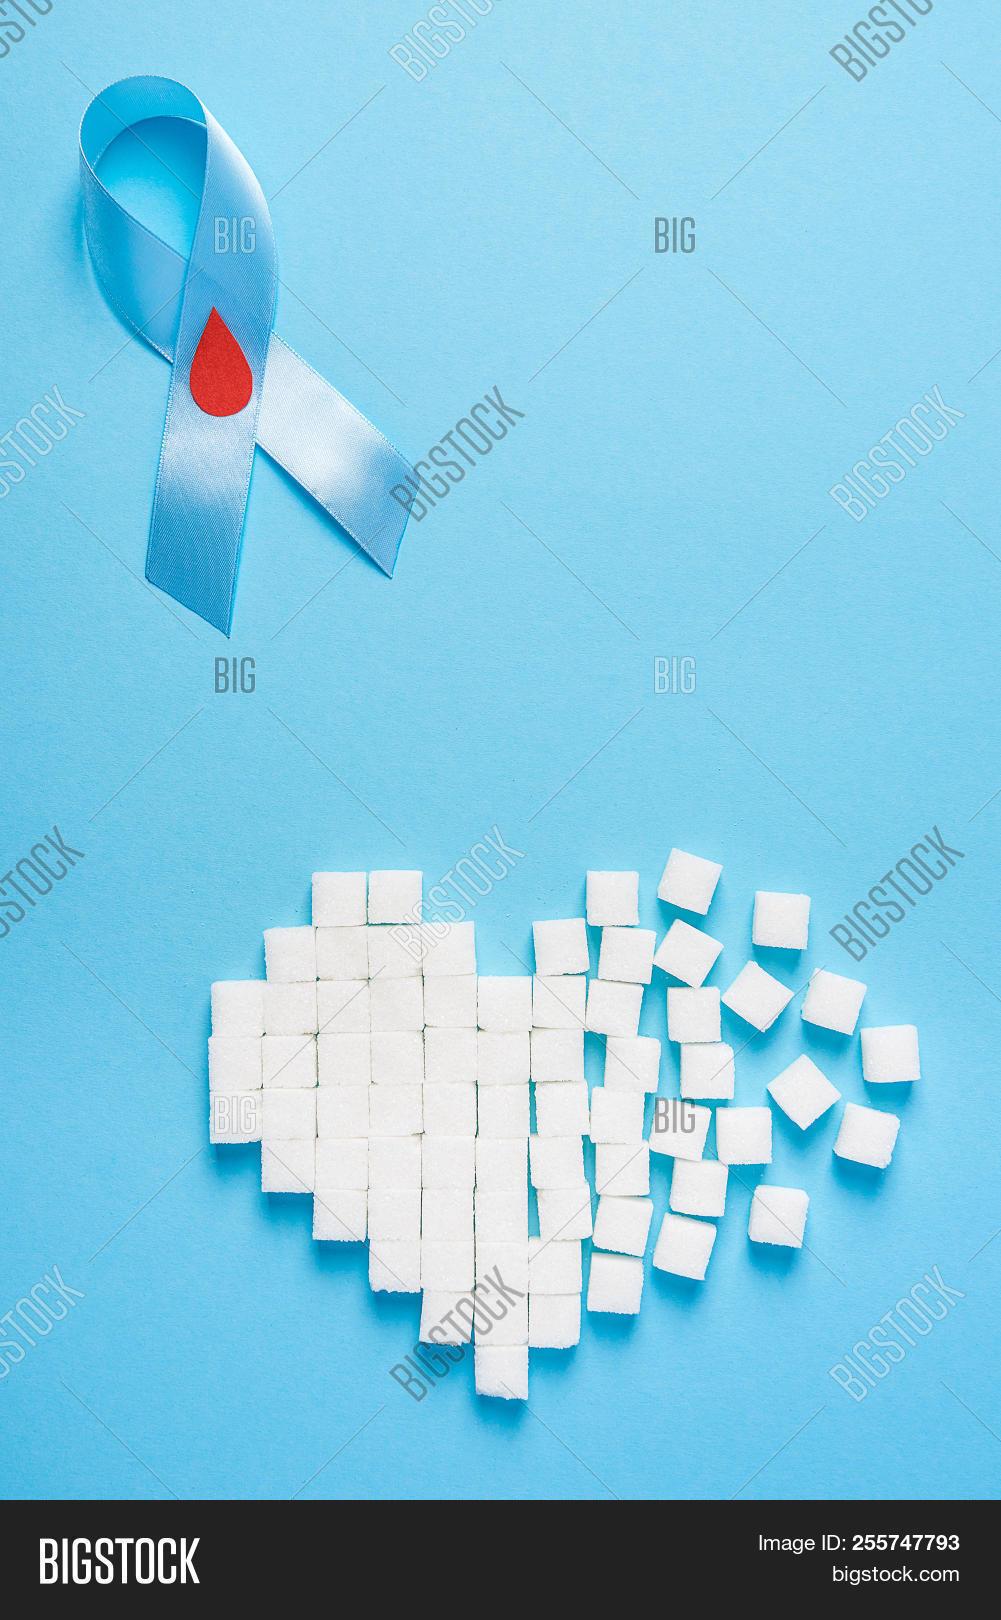 Blue Ribbon Awareness Image & Photo (Free Trial) | Bigstock